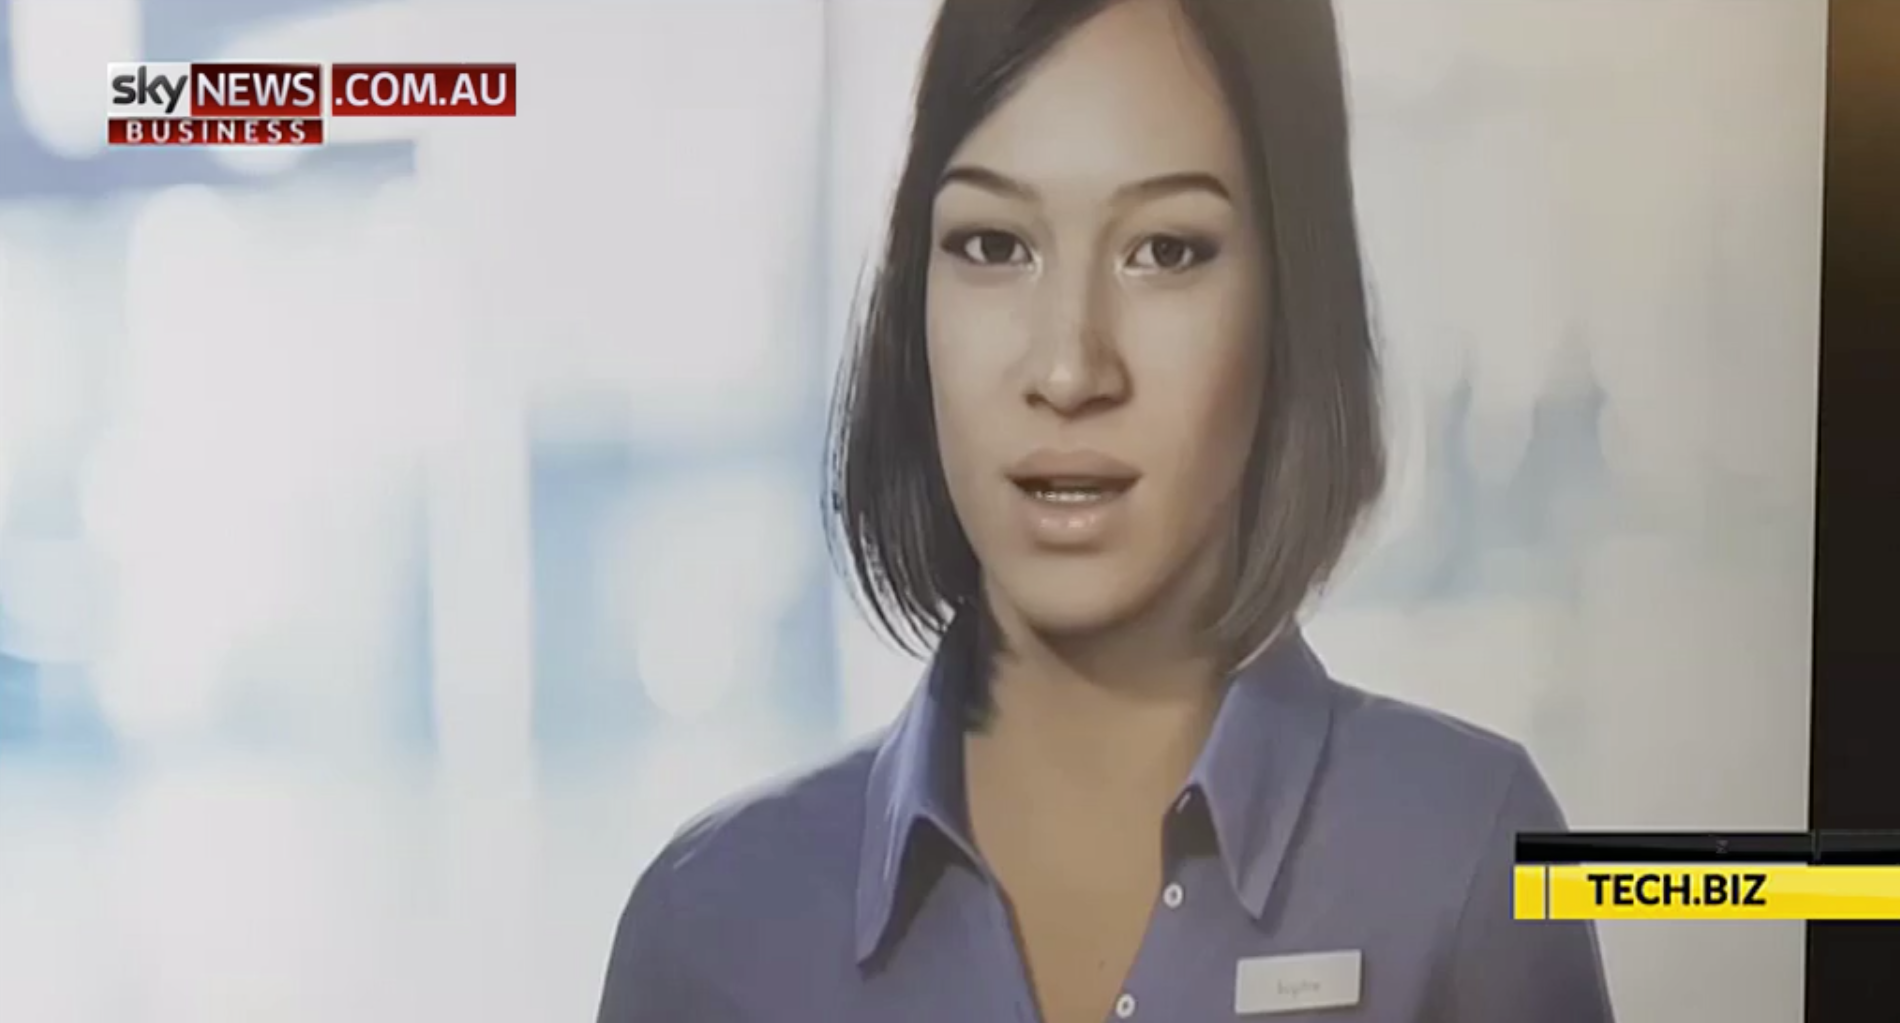 sophie-news-sky-tv-australia-cebit-2018